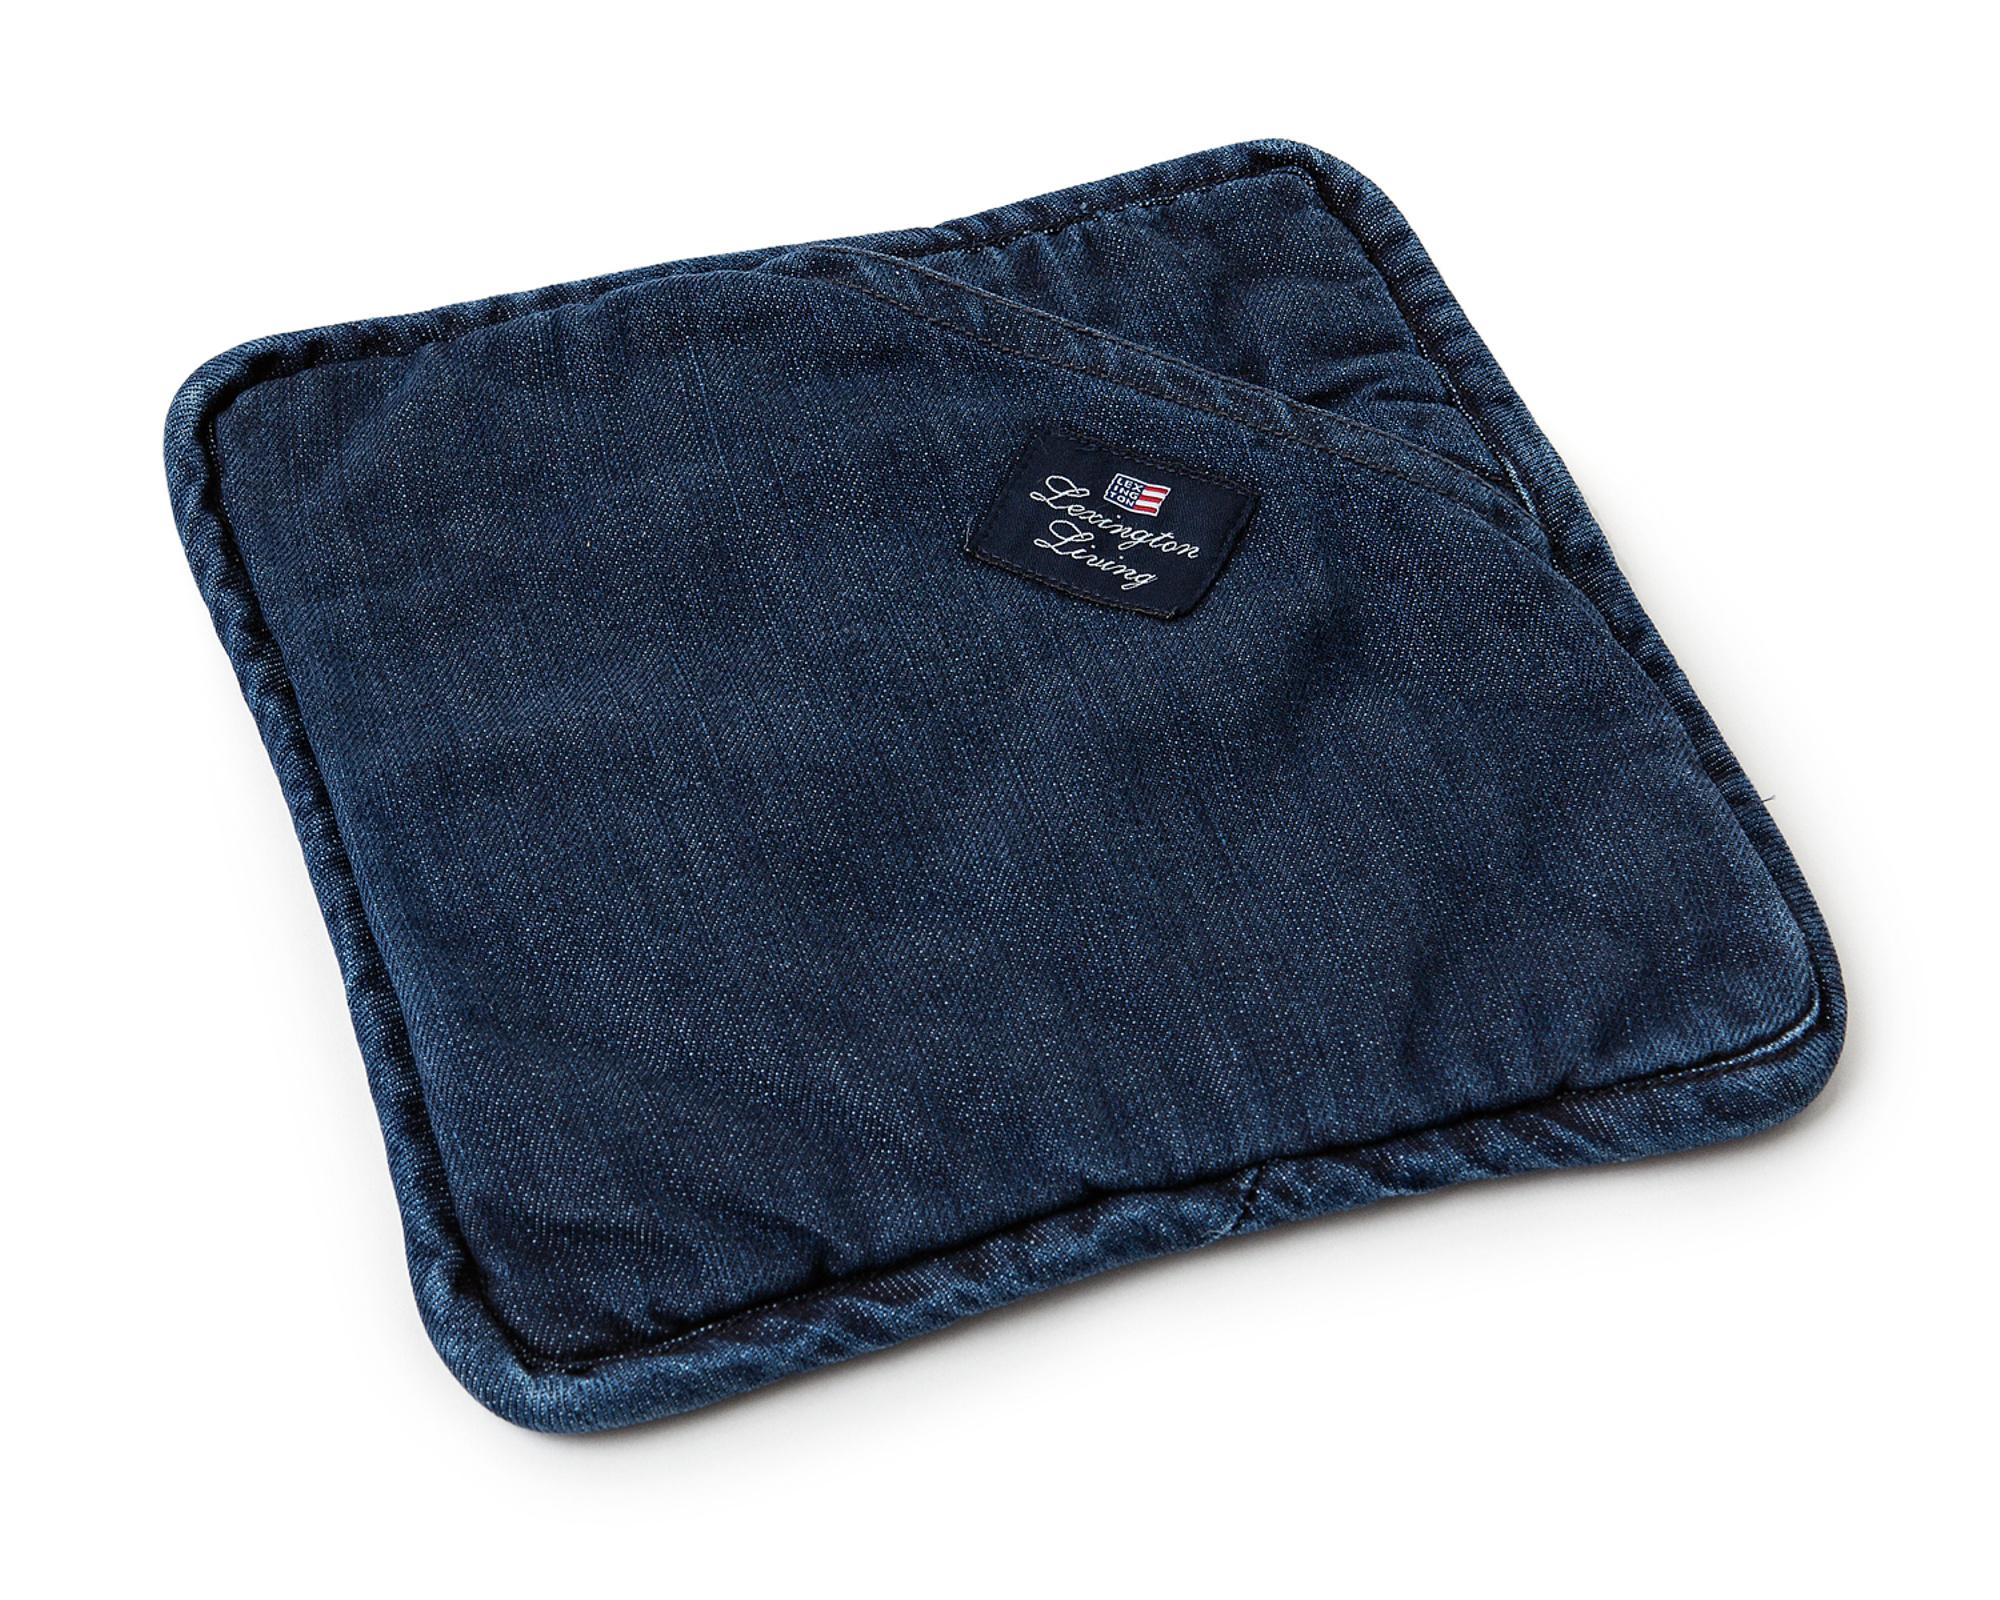 Jeans Potholder